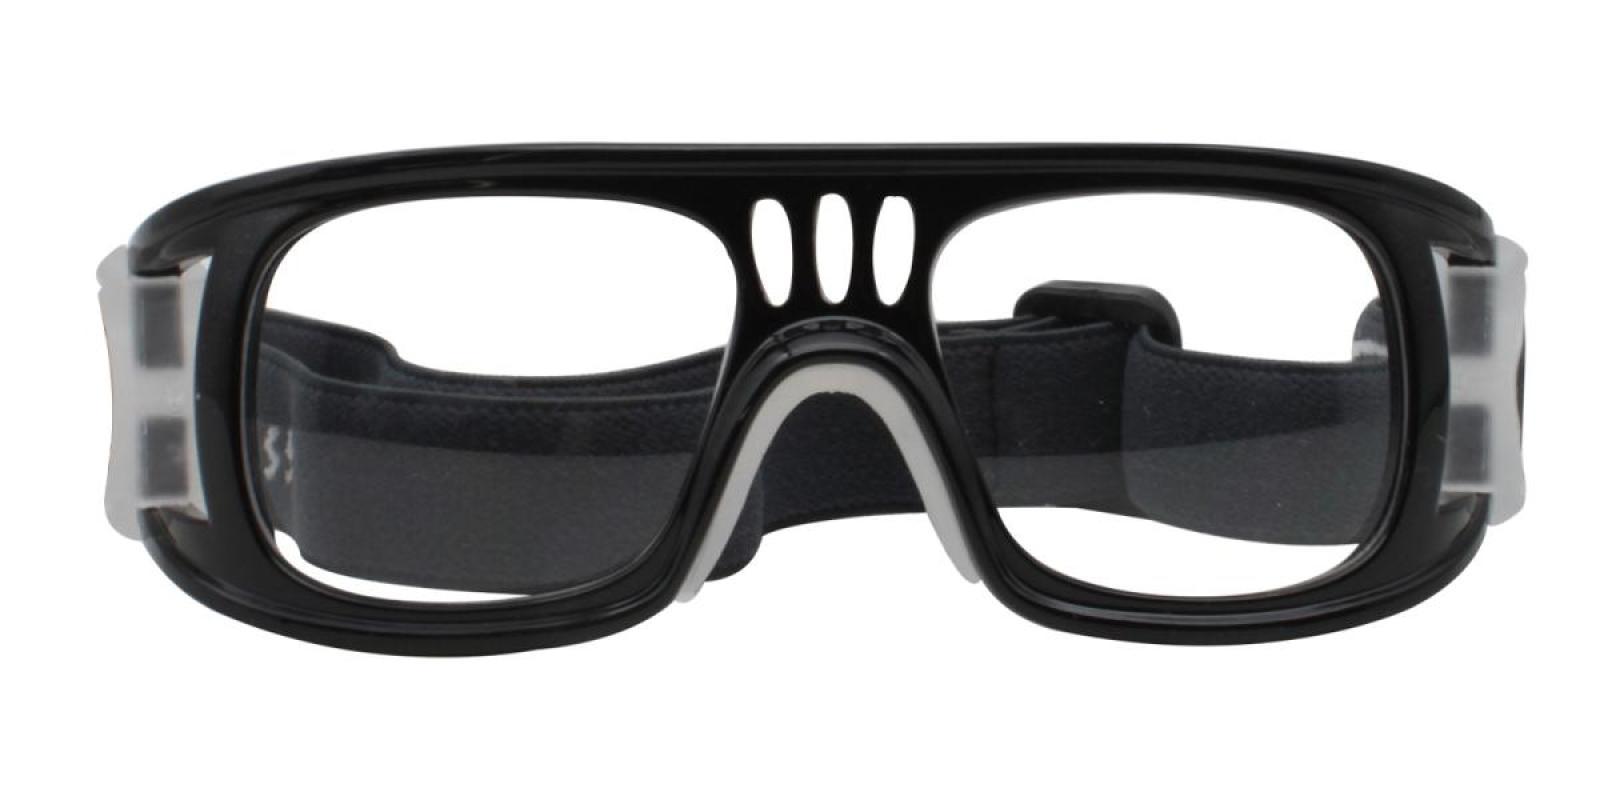 Baskinpo-Black-Square-Plastic-SportsGlasses-additional2